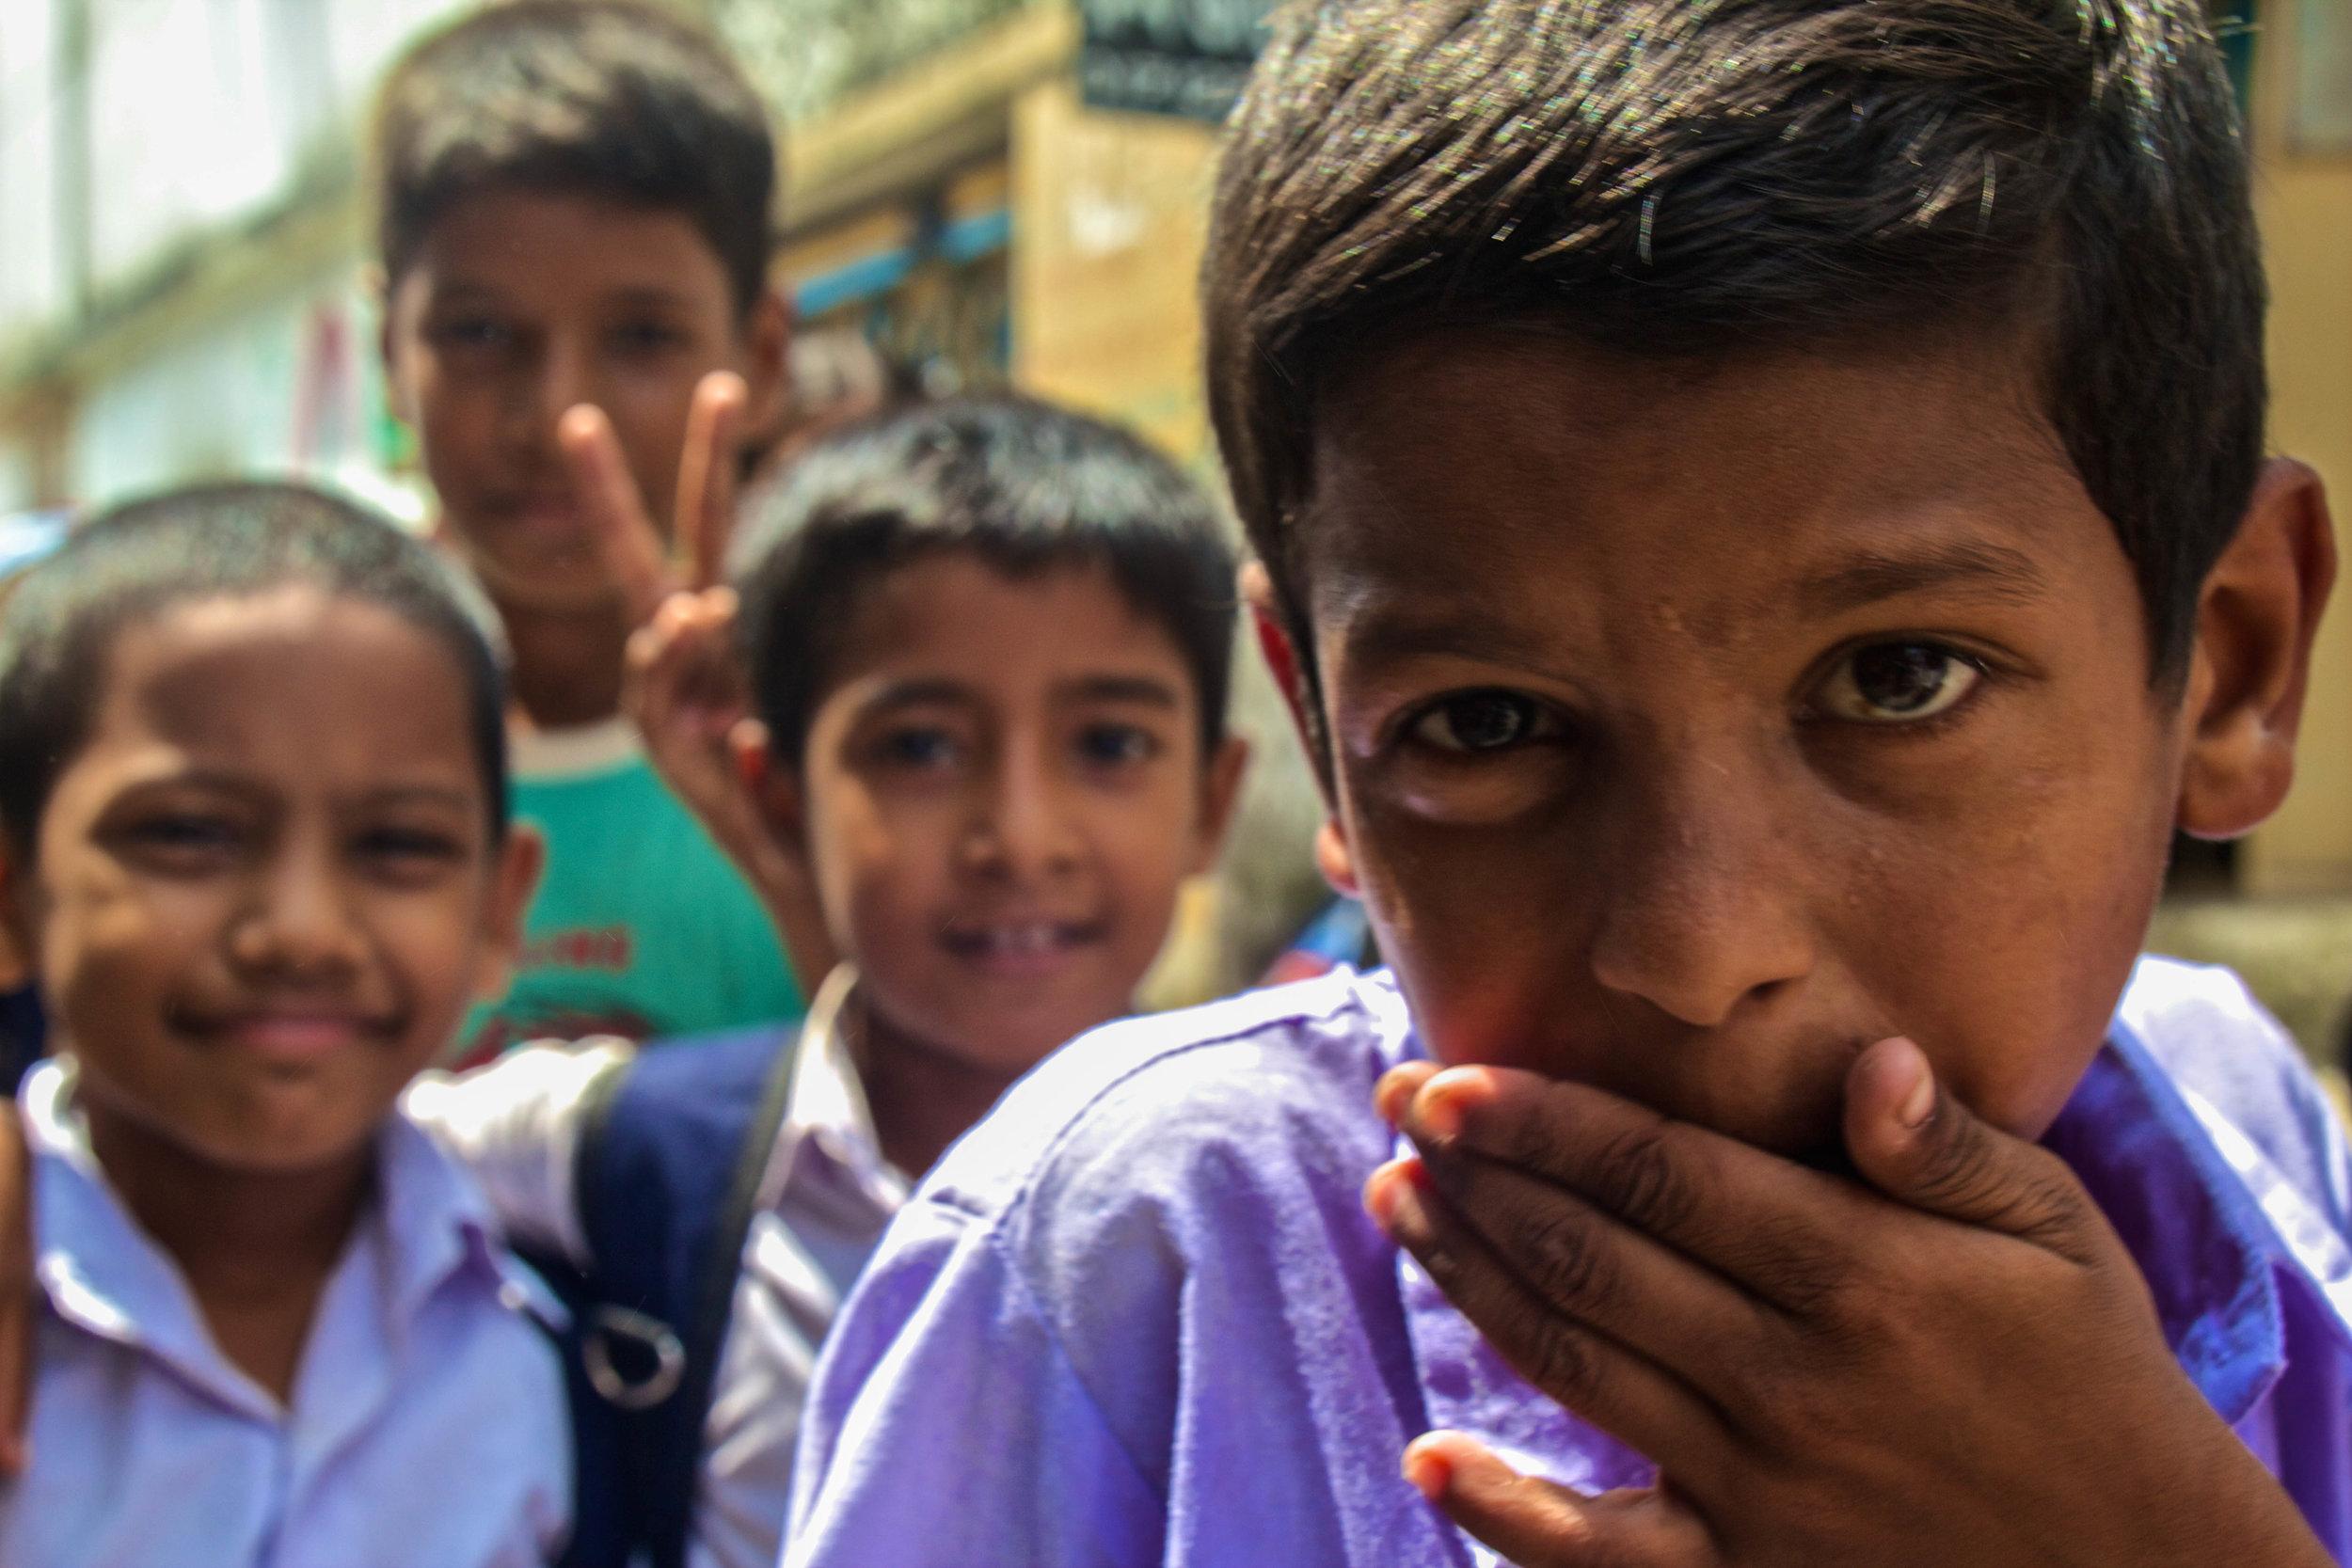 dhaka bangladesh jaago school children-3-3.jpg